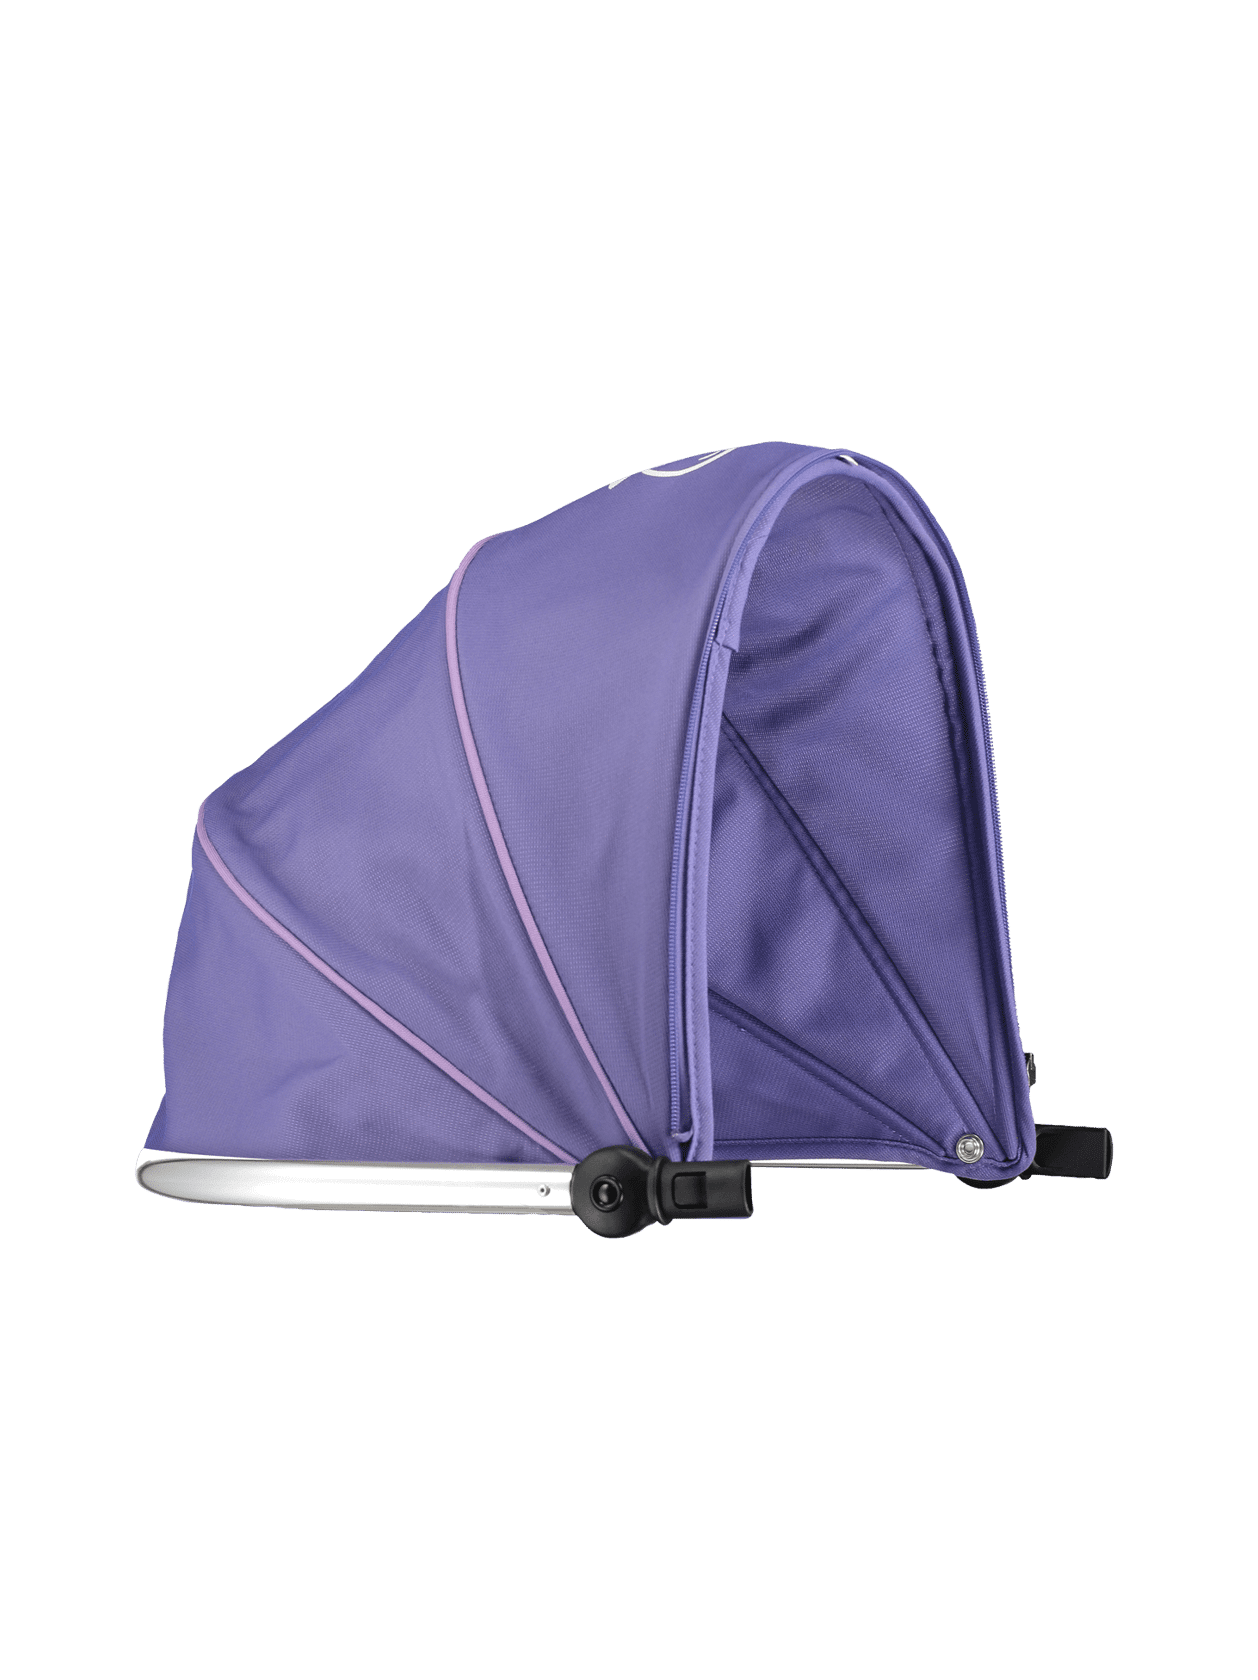 Peach Lower Seat Hood - Parma Violet